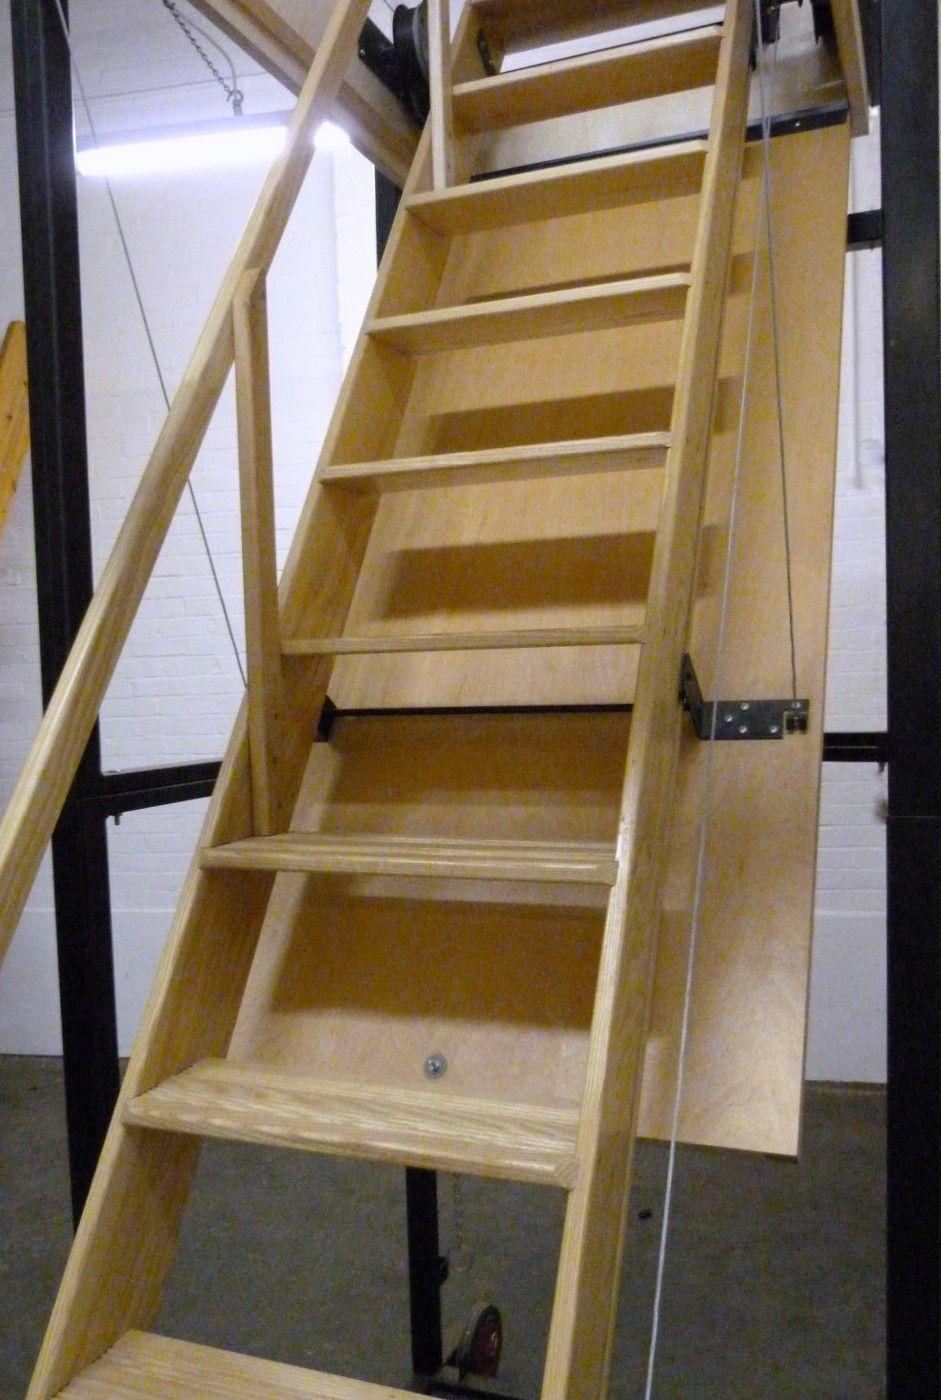 Folding Attic Ladder Small Opening Attic Stairs Folding Attic Stairs Stairs